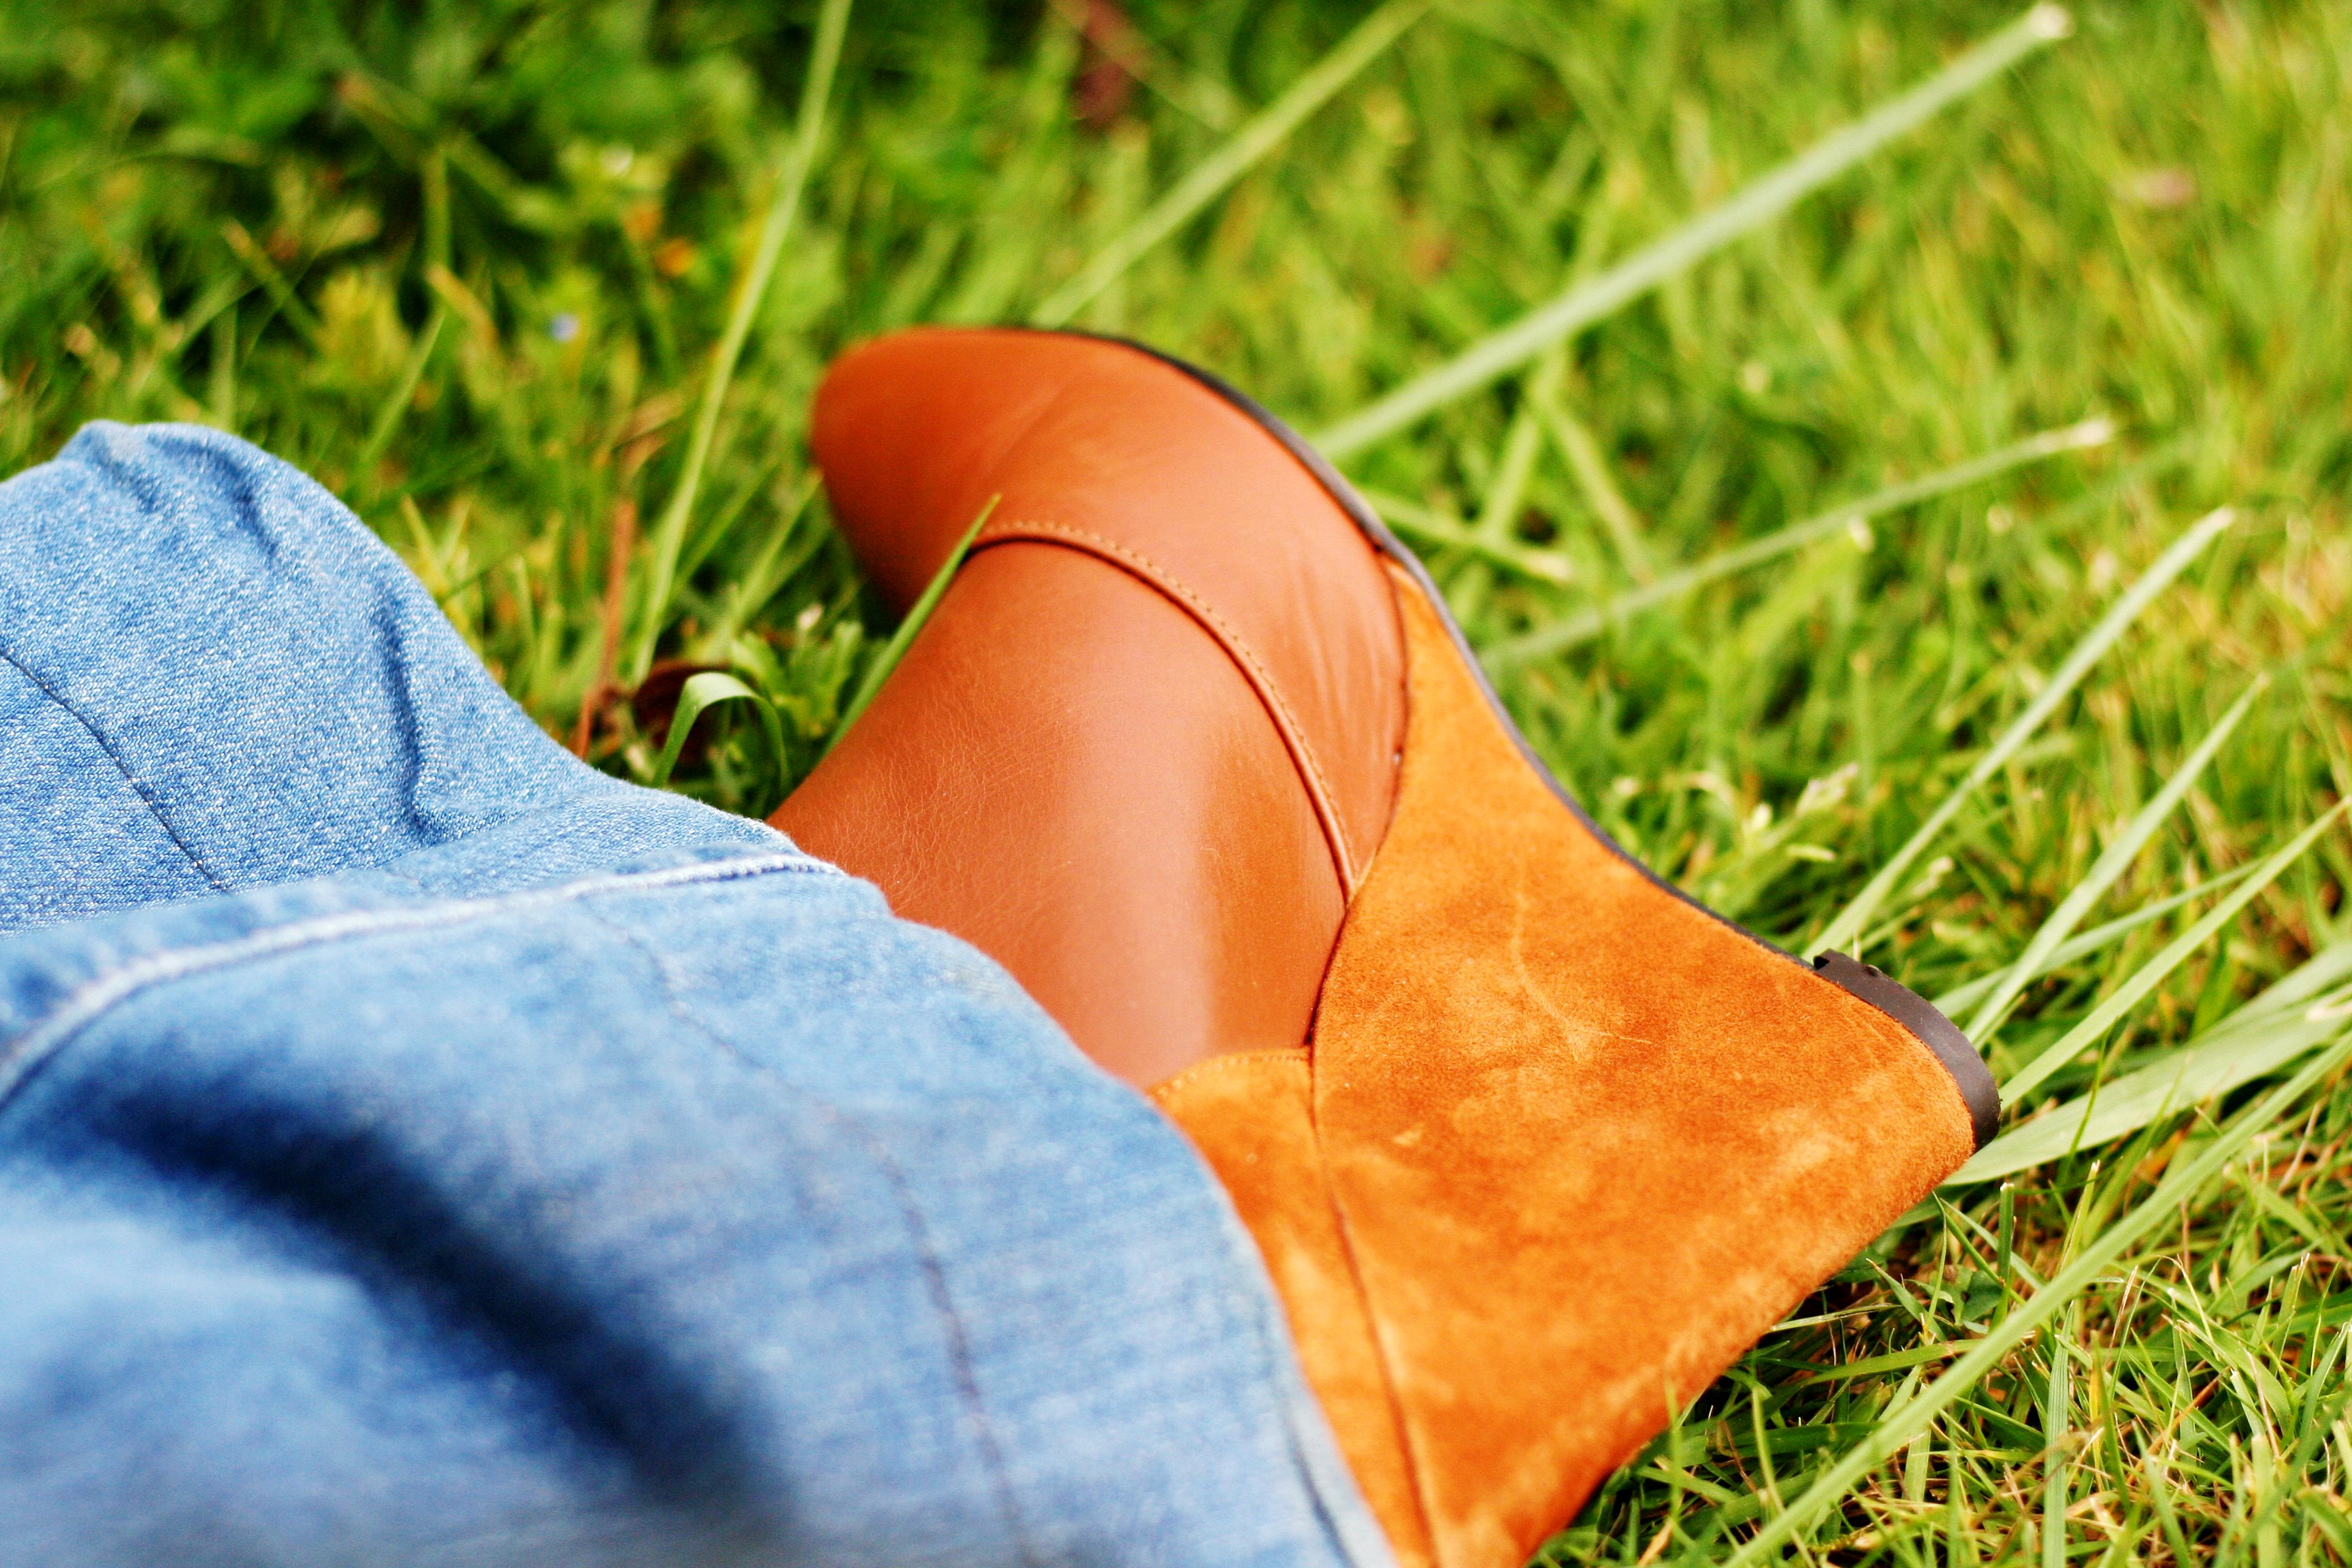 jean-flare-blog-mode-sac-longchamp-au-sultan-american-vintage-top-blogueuse-mode-boots-zign